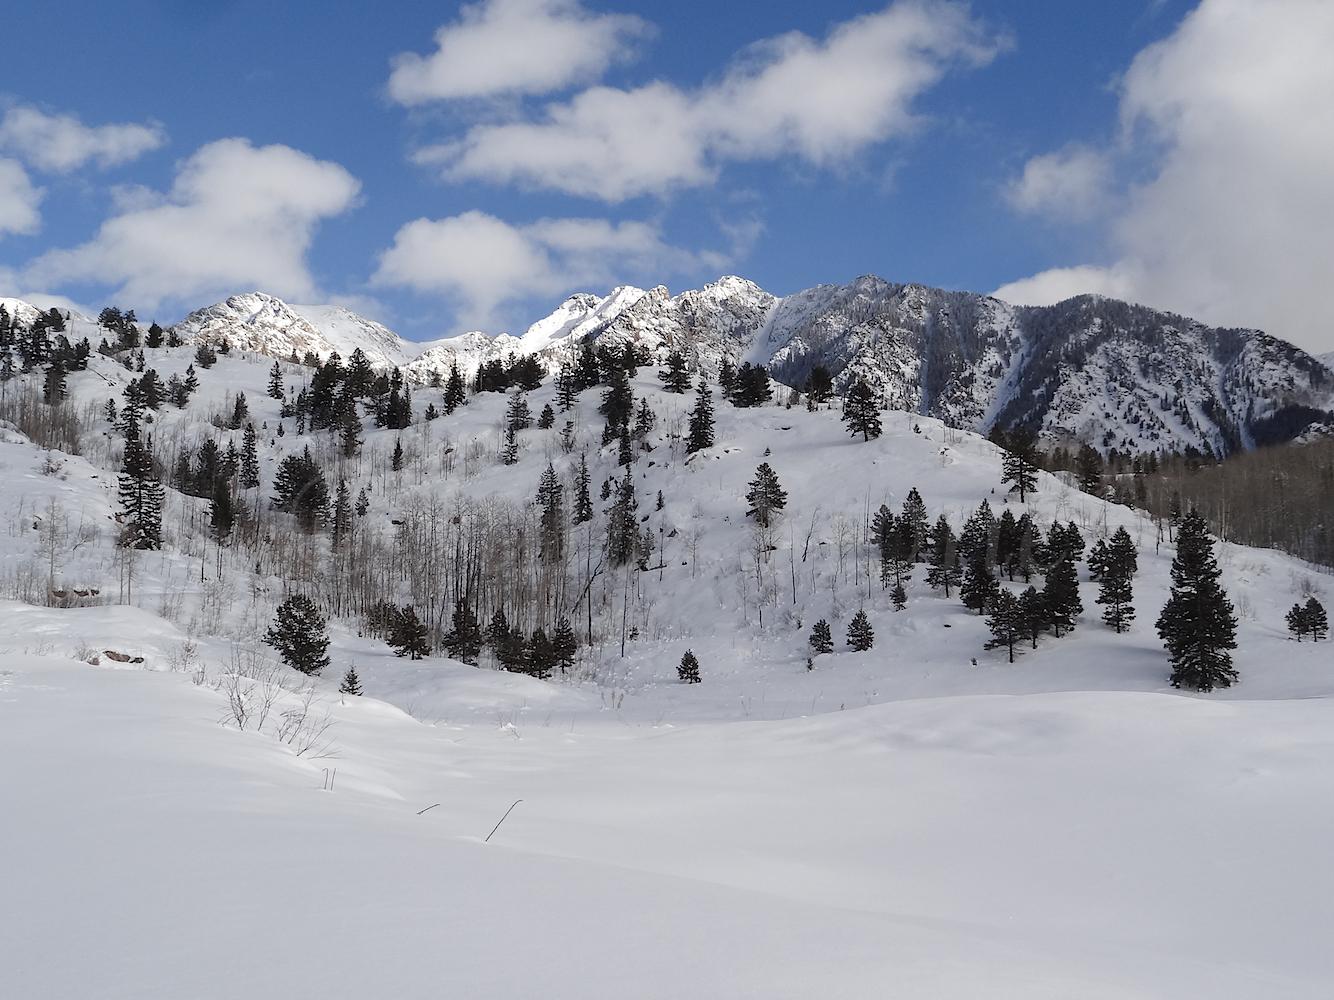 Lime Creek Road Snowshoe, Image #5336